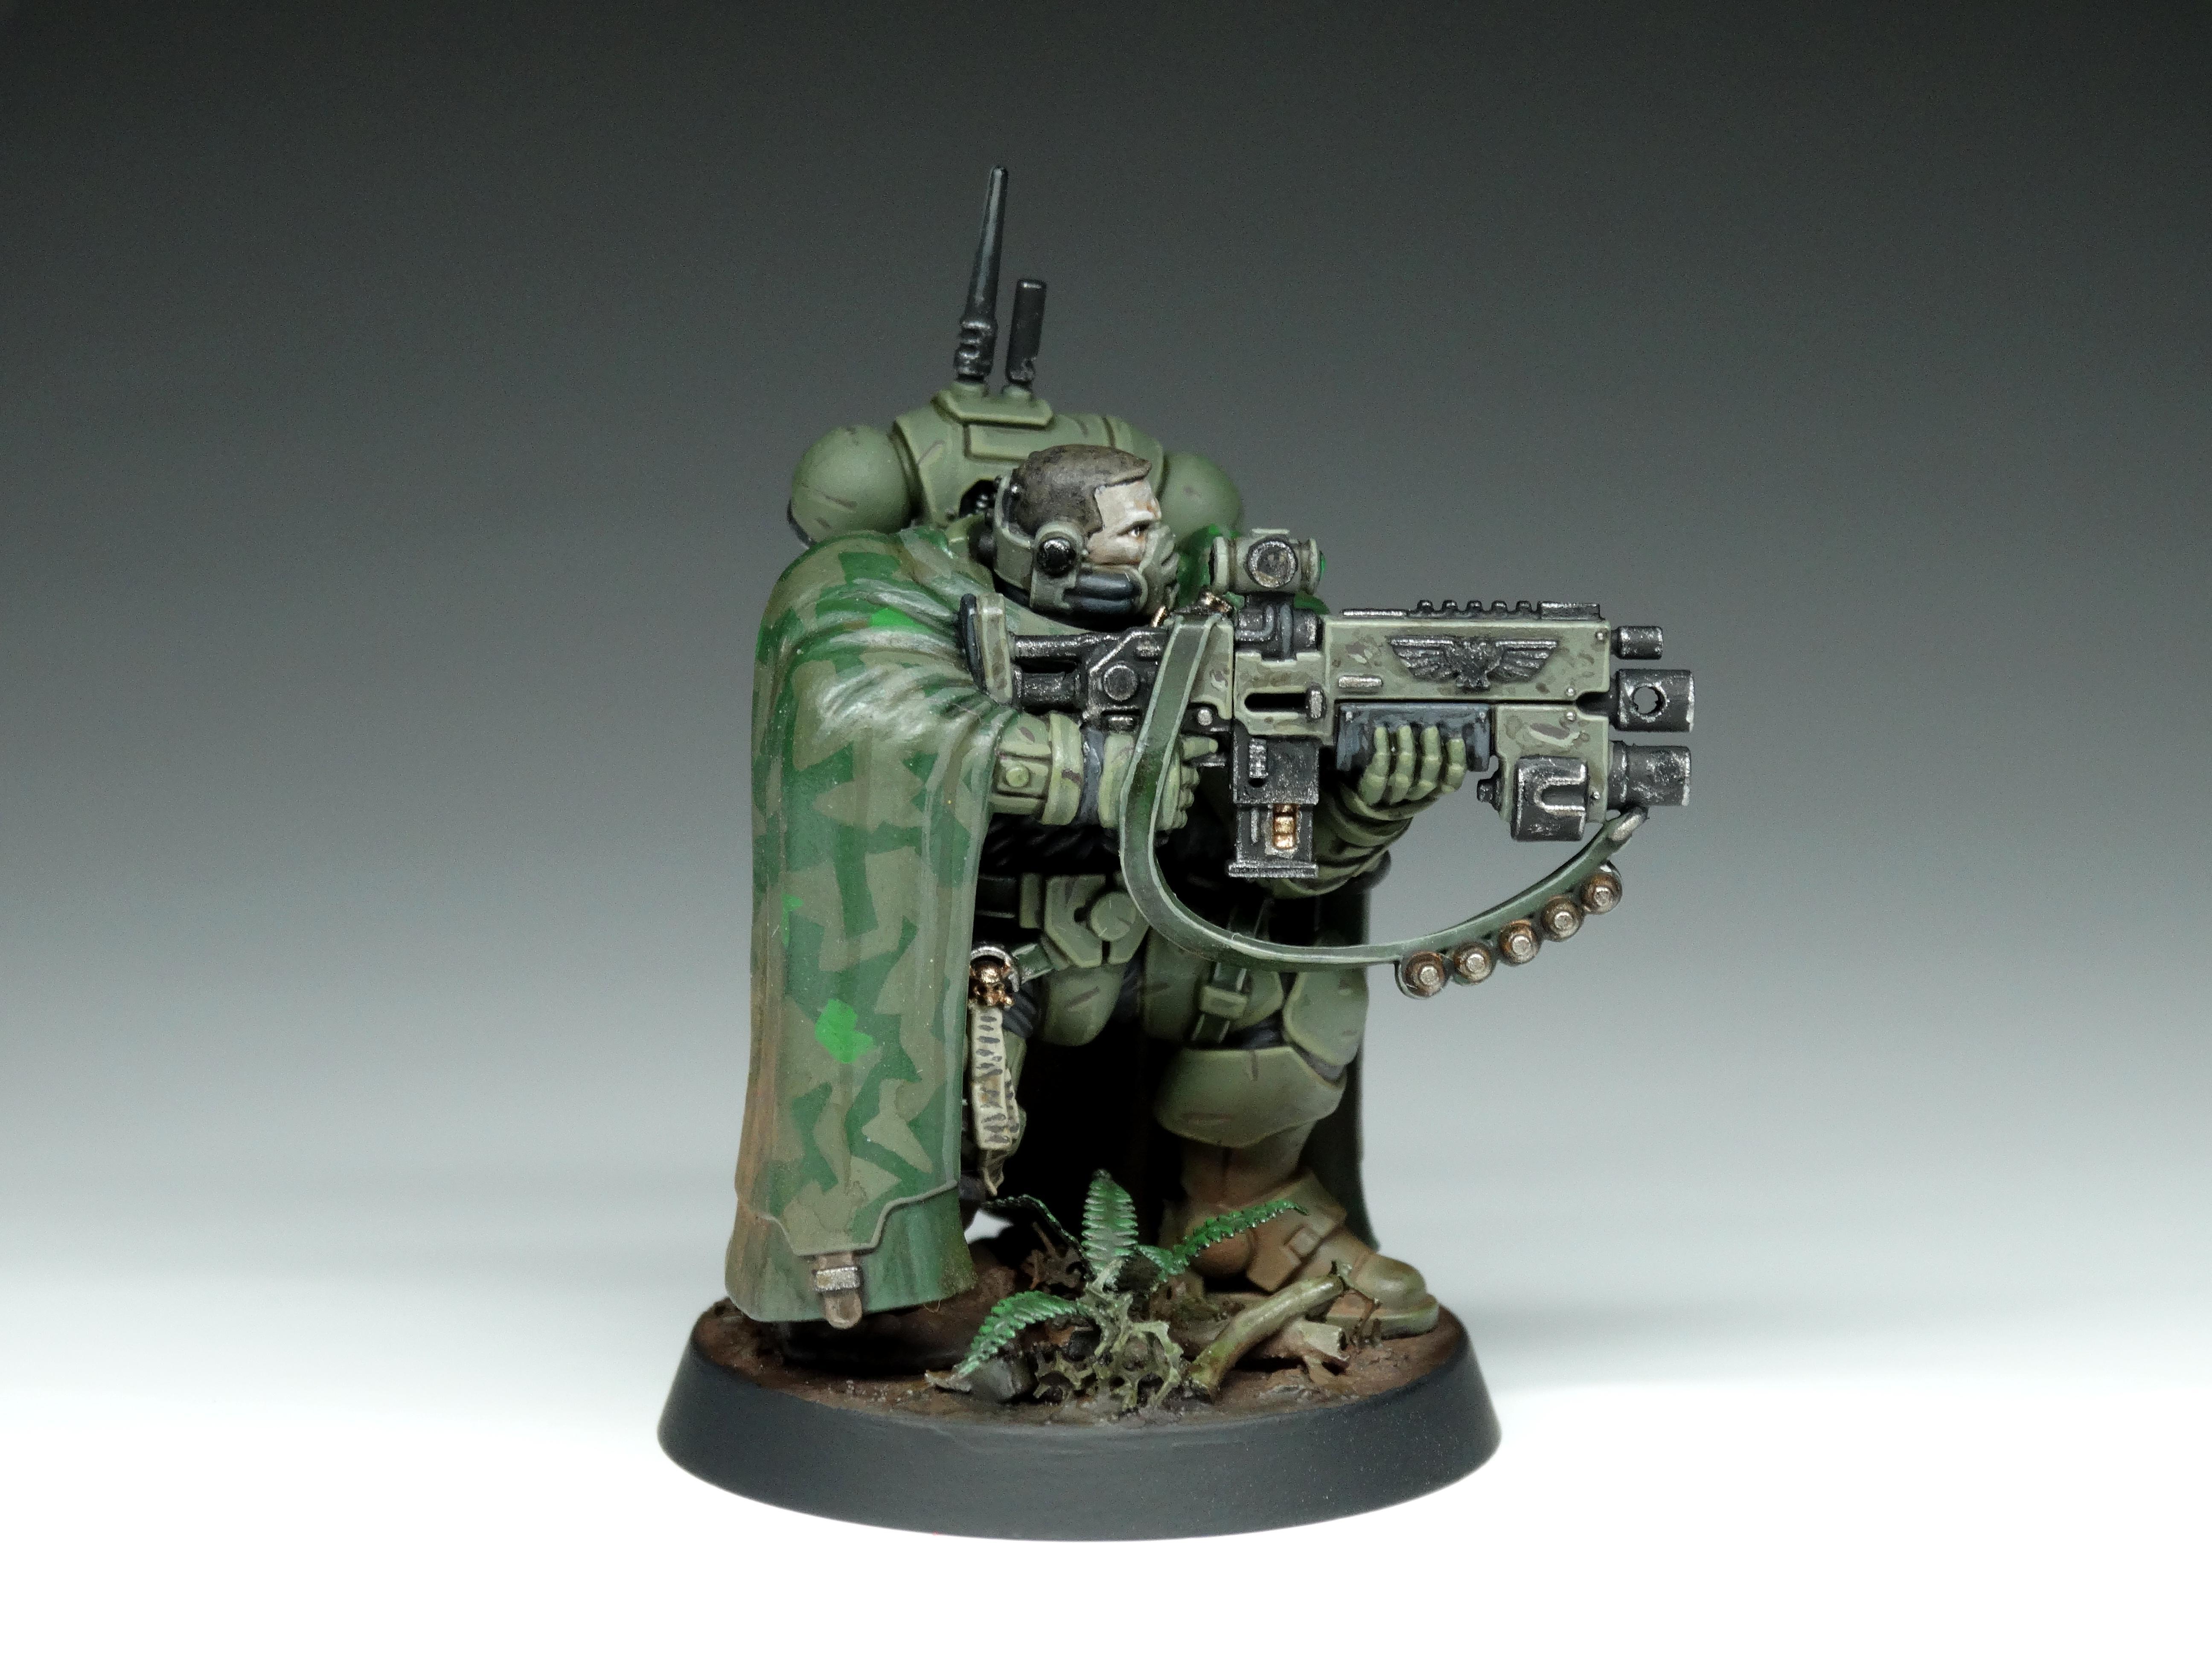 Adeptus Astartes, Conversion, Killteam, Kitbash, Primaris, Raptors, Space Marines, Warhammer 40,000